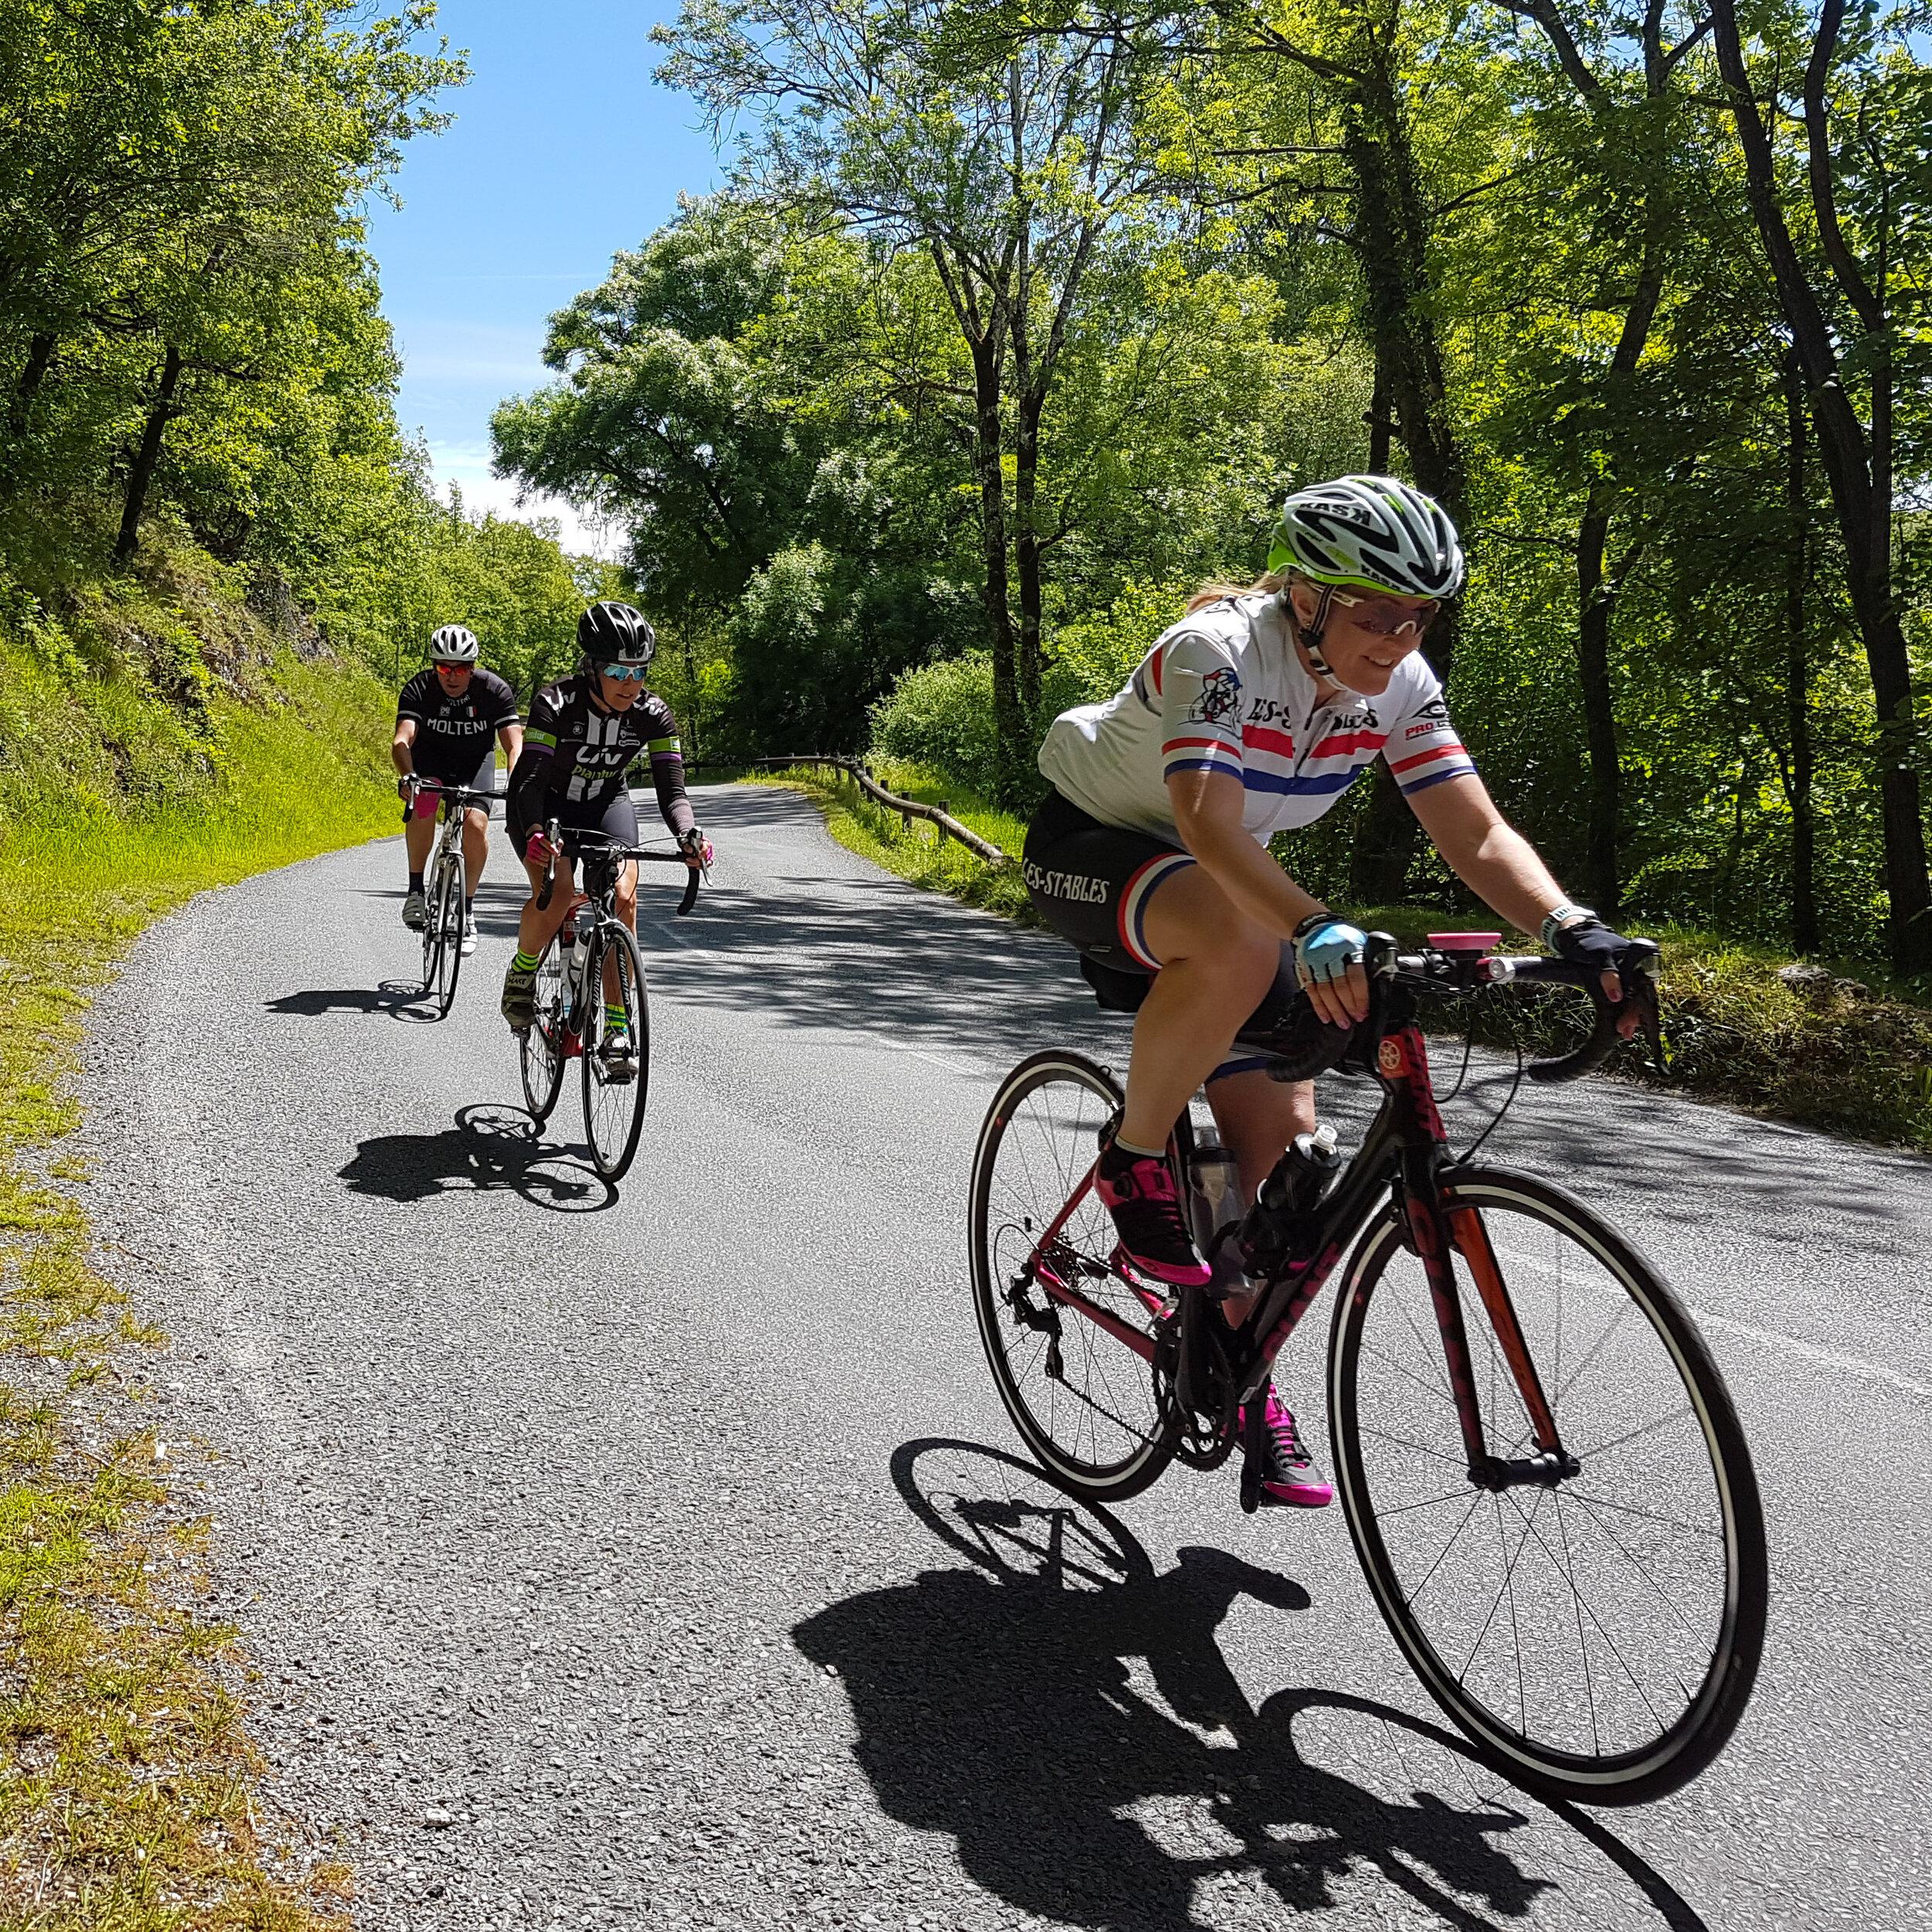 Cycling at Les Stables